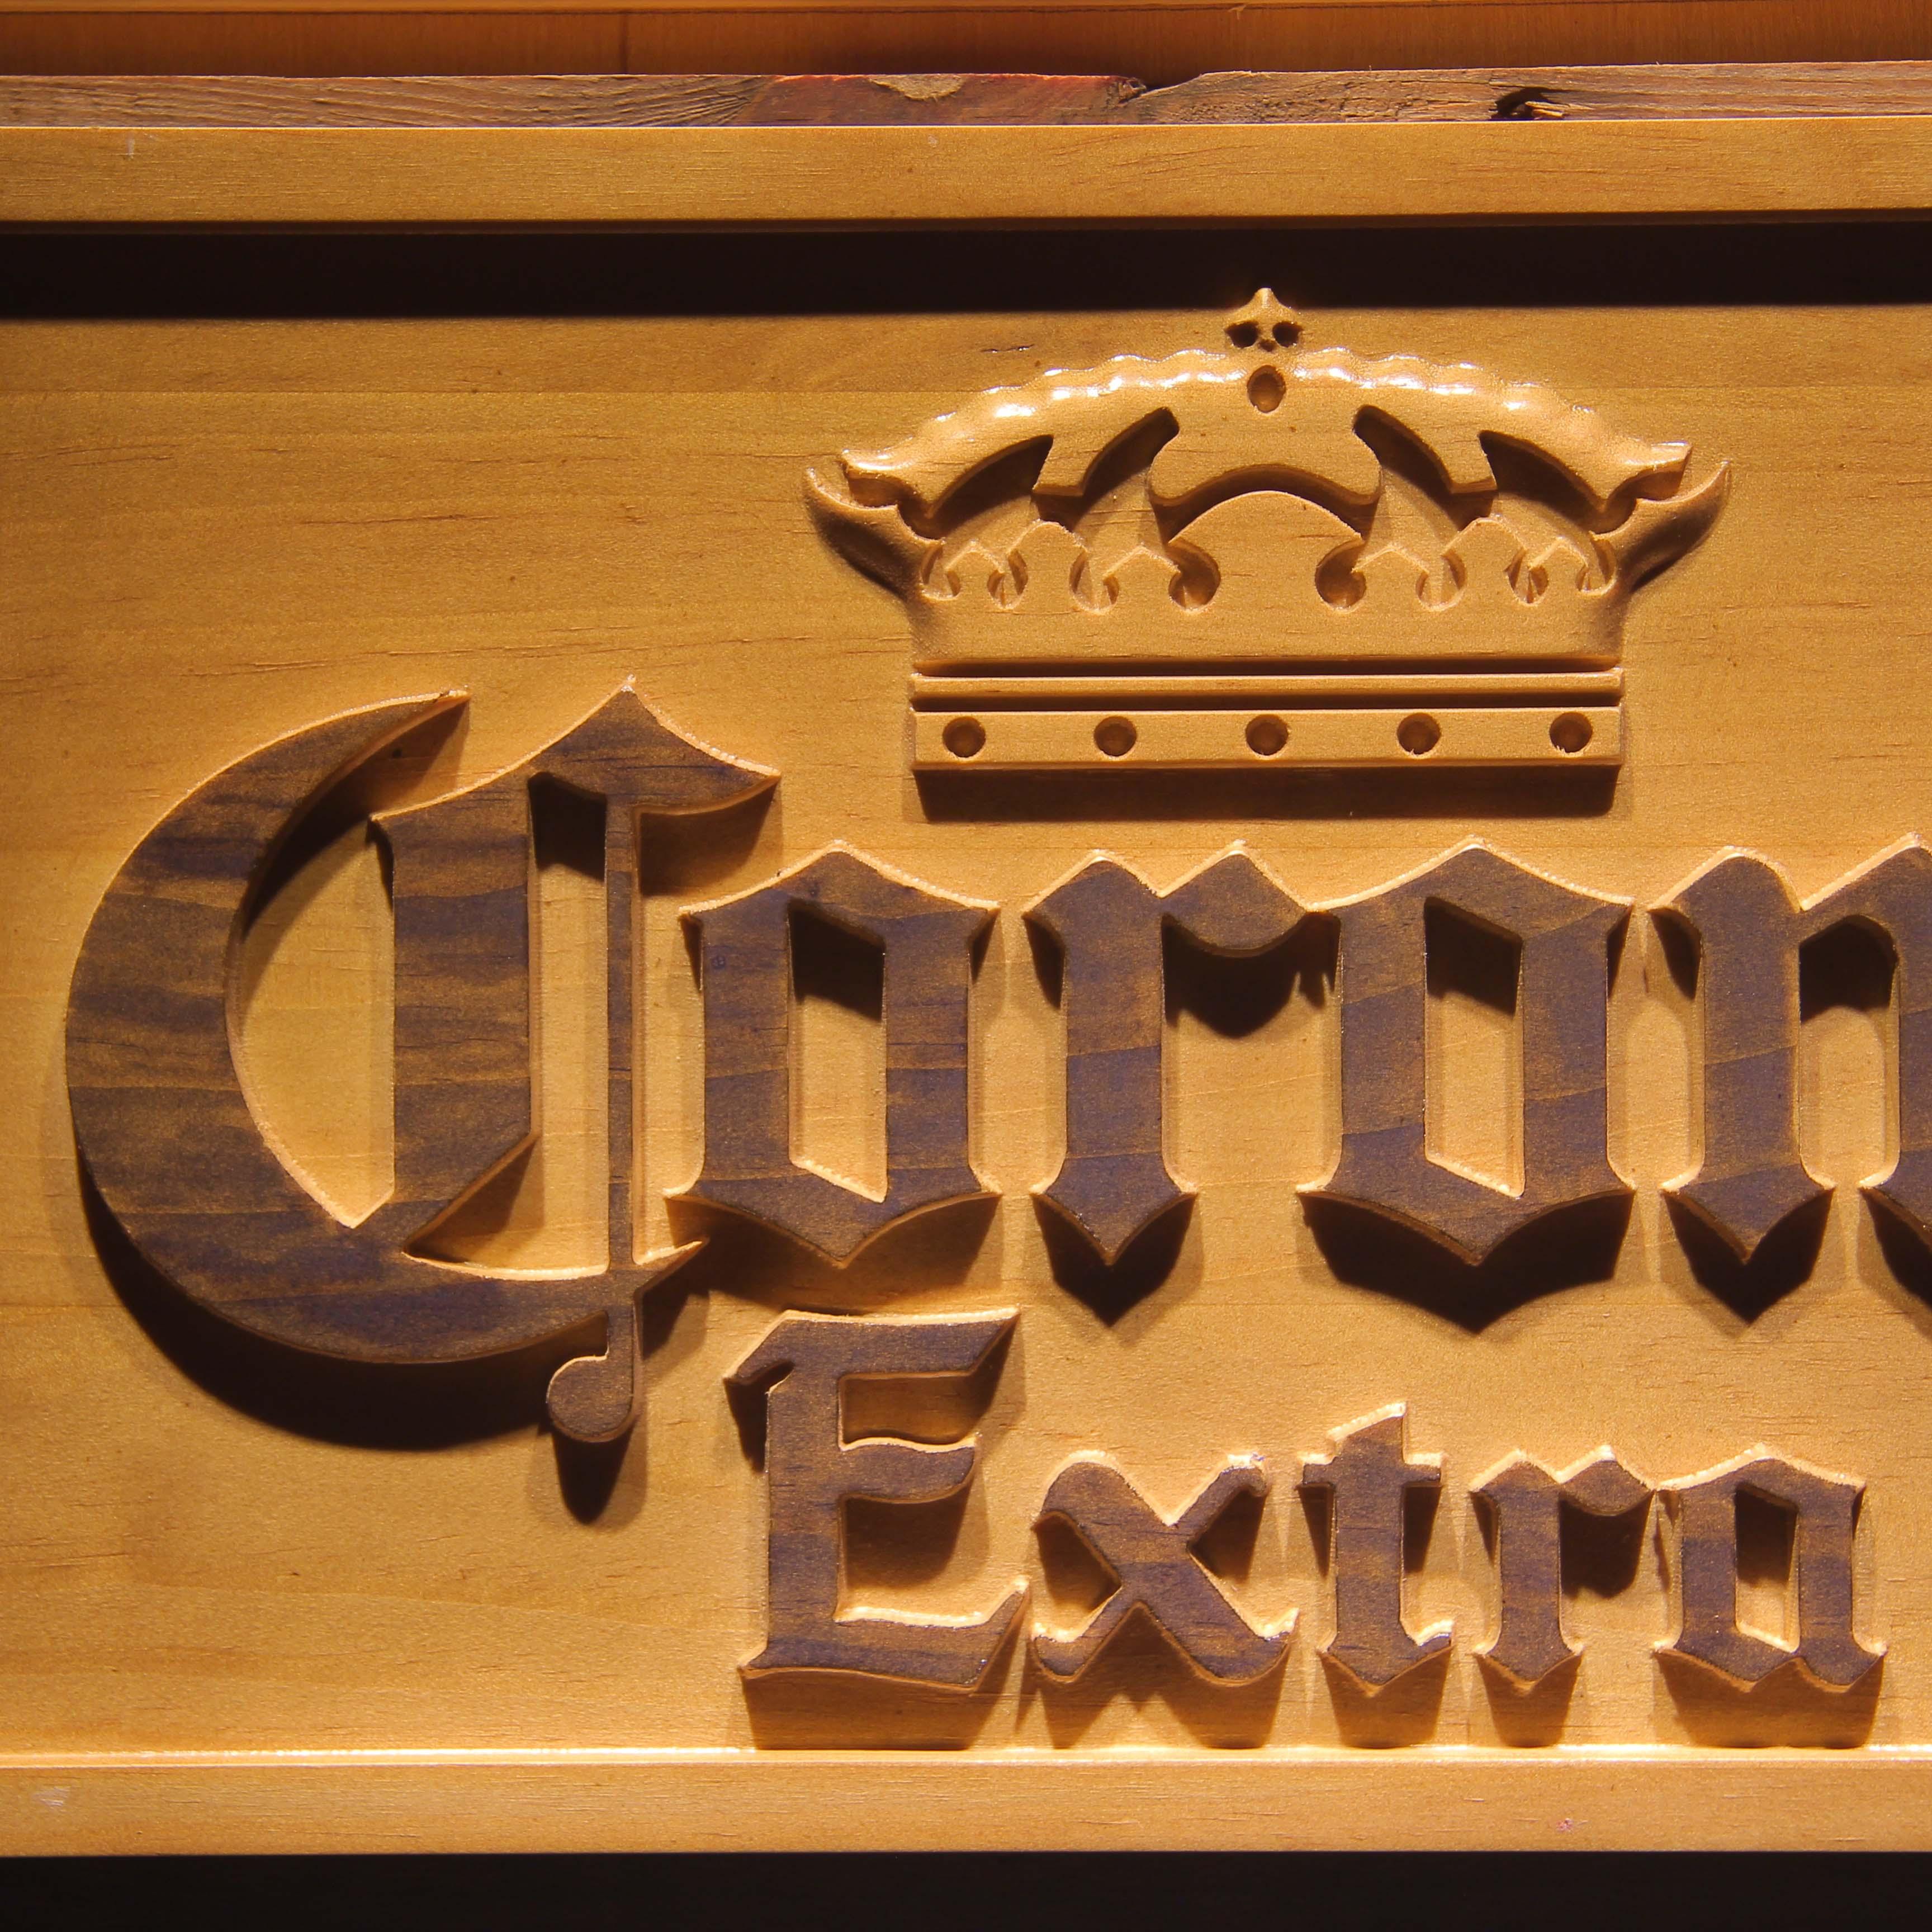 Corona Extra Beer 3D Wooden Sign